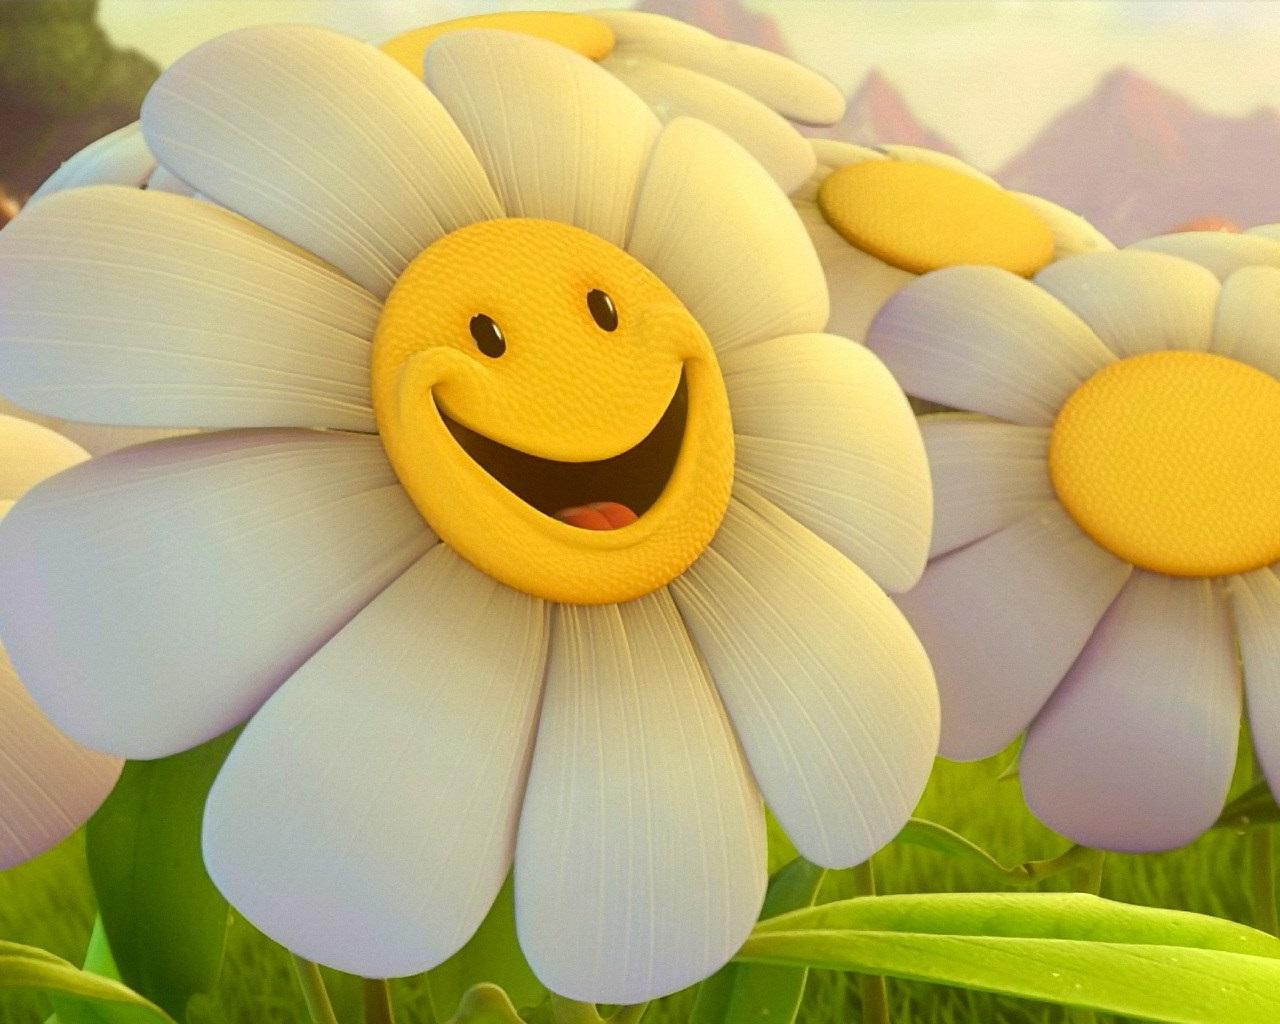 smile-keep-smiling-11813858-1280-1024.jpg